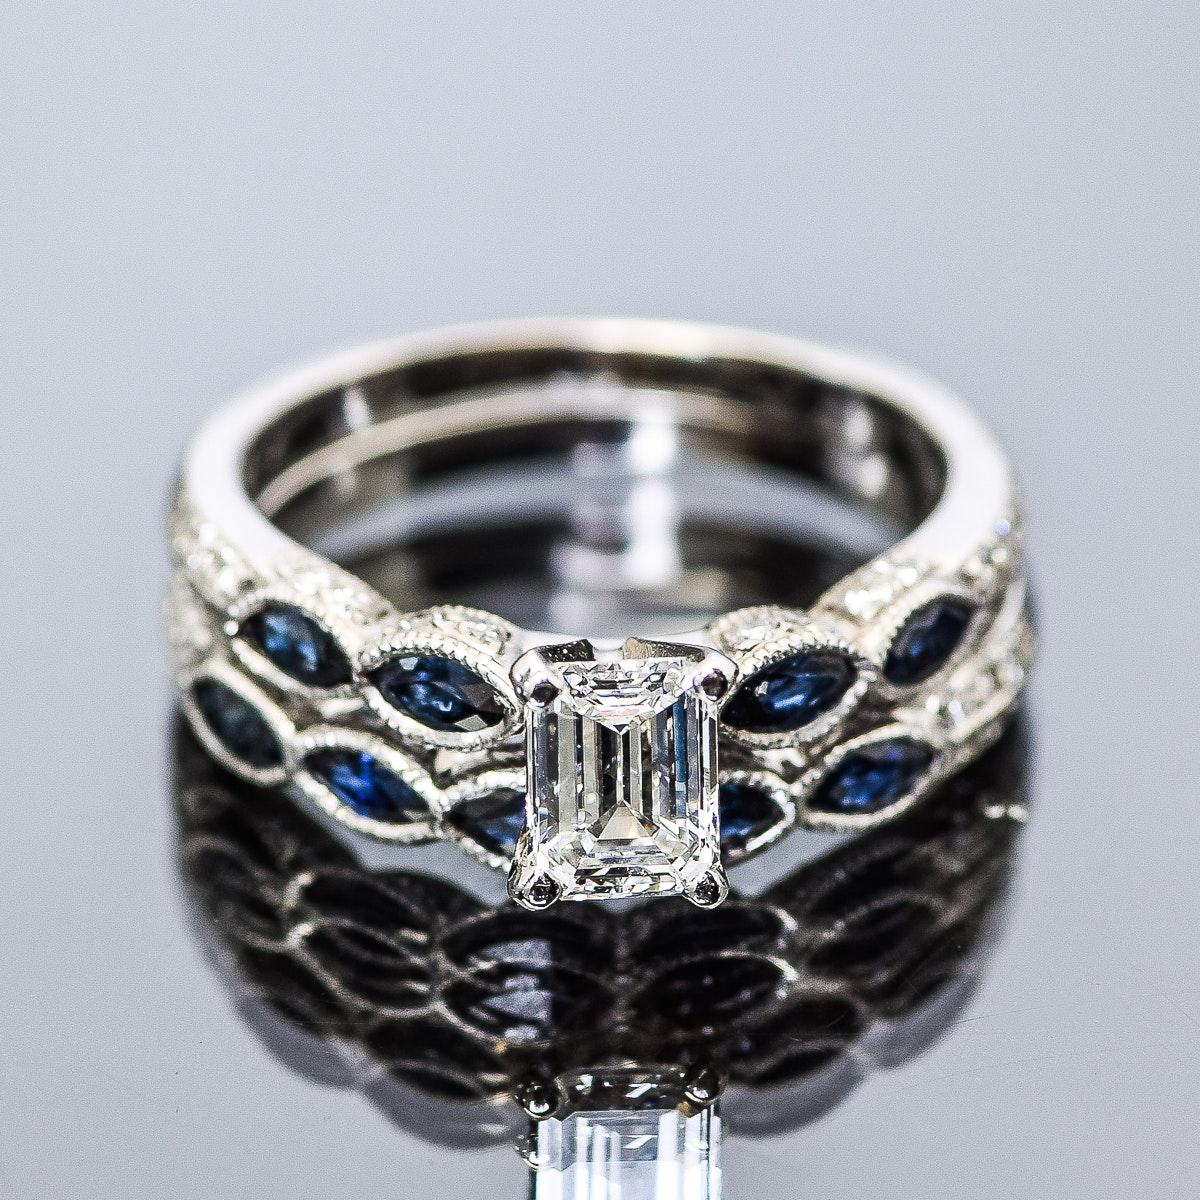 18K White Gold, Sapphire and 1.03 CTW Diamond Wedding Ring Set